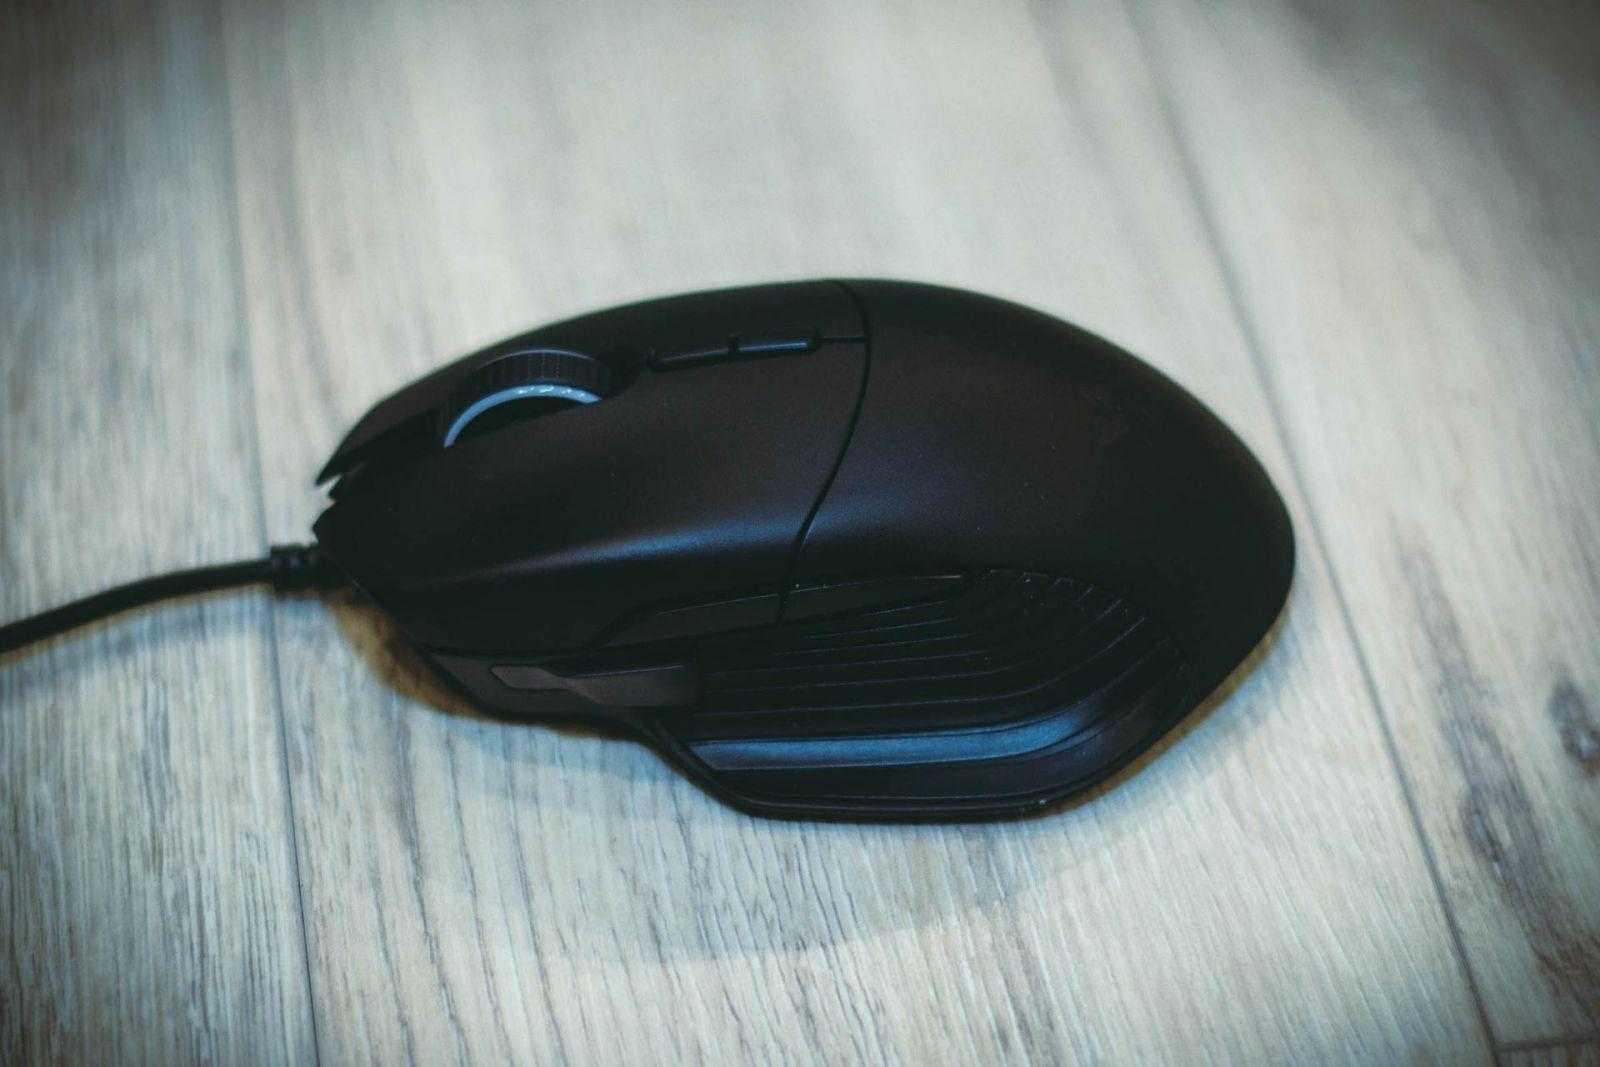 Мышка Razer Basilisk на столе